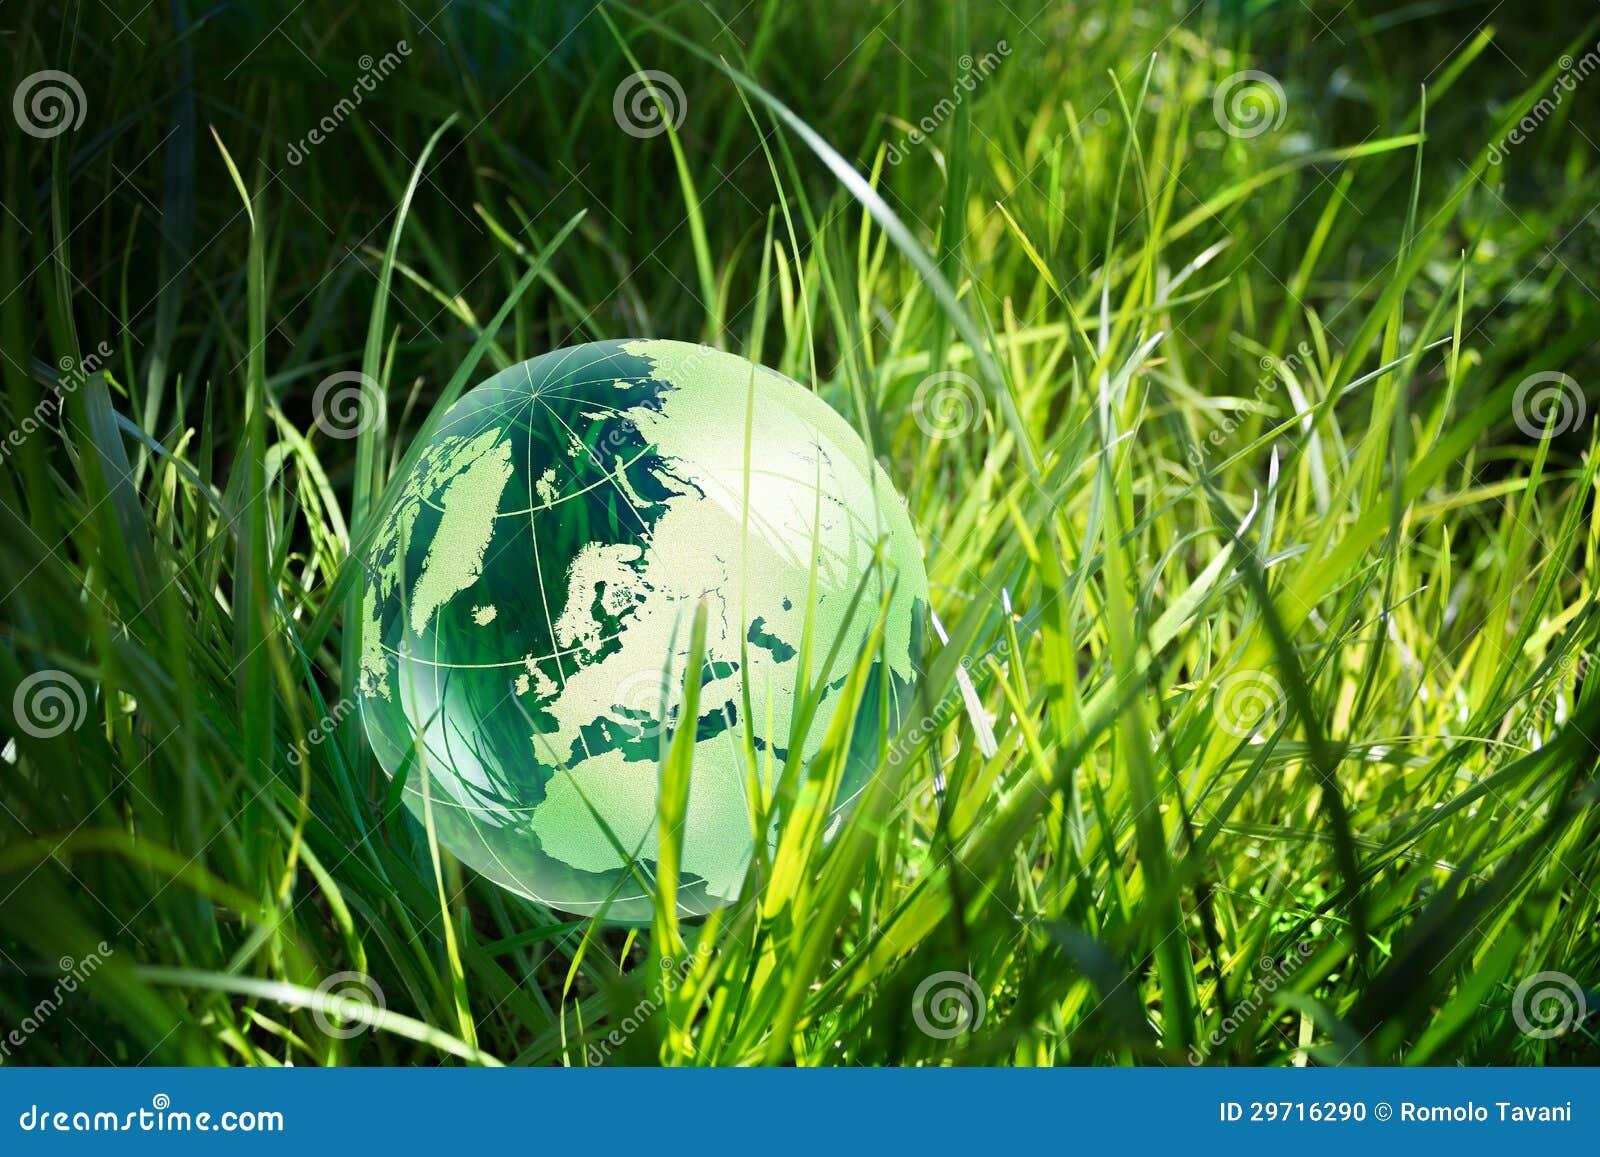 Globo de vidro na grama